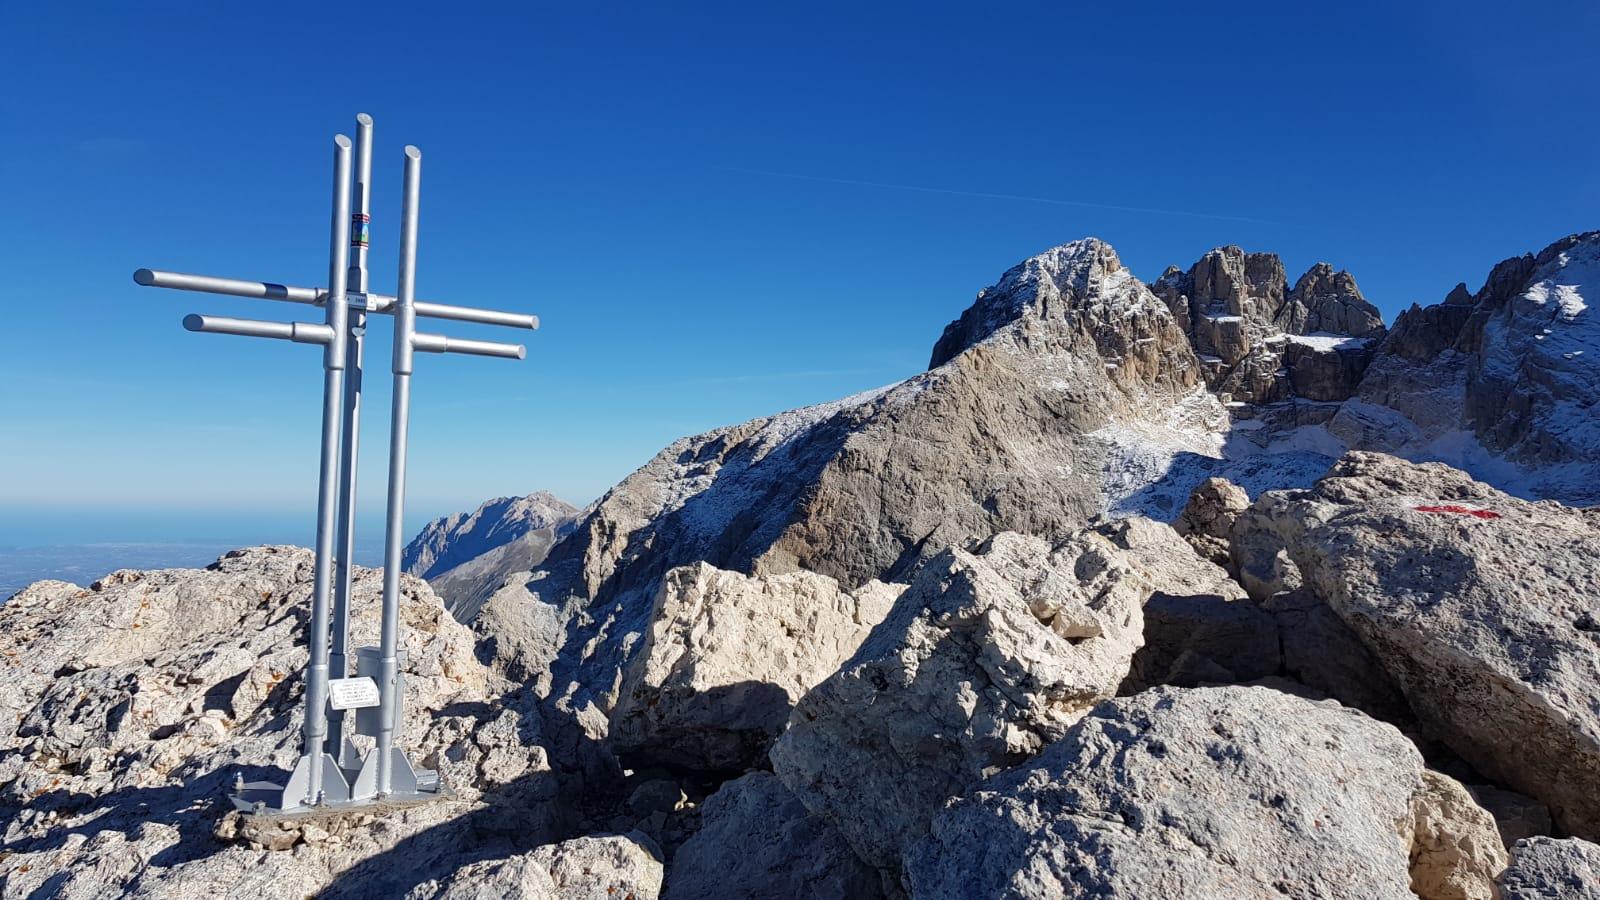 Croci e opere d'arte in montagna. Sì o No?